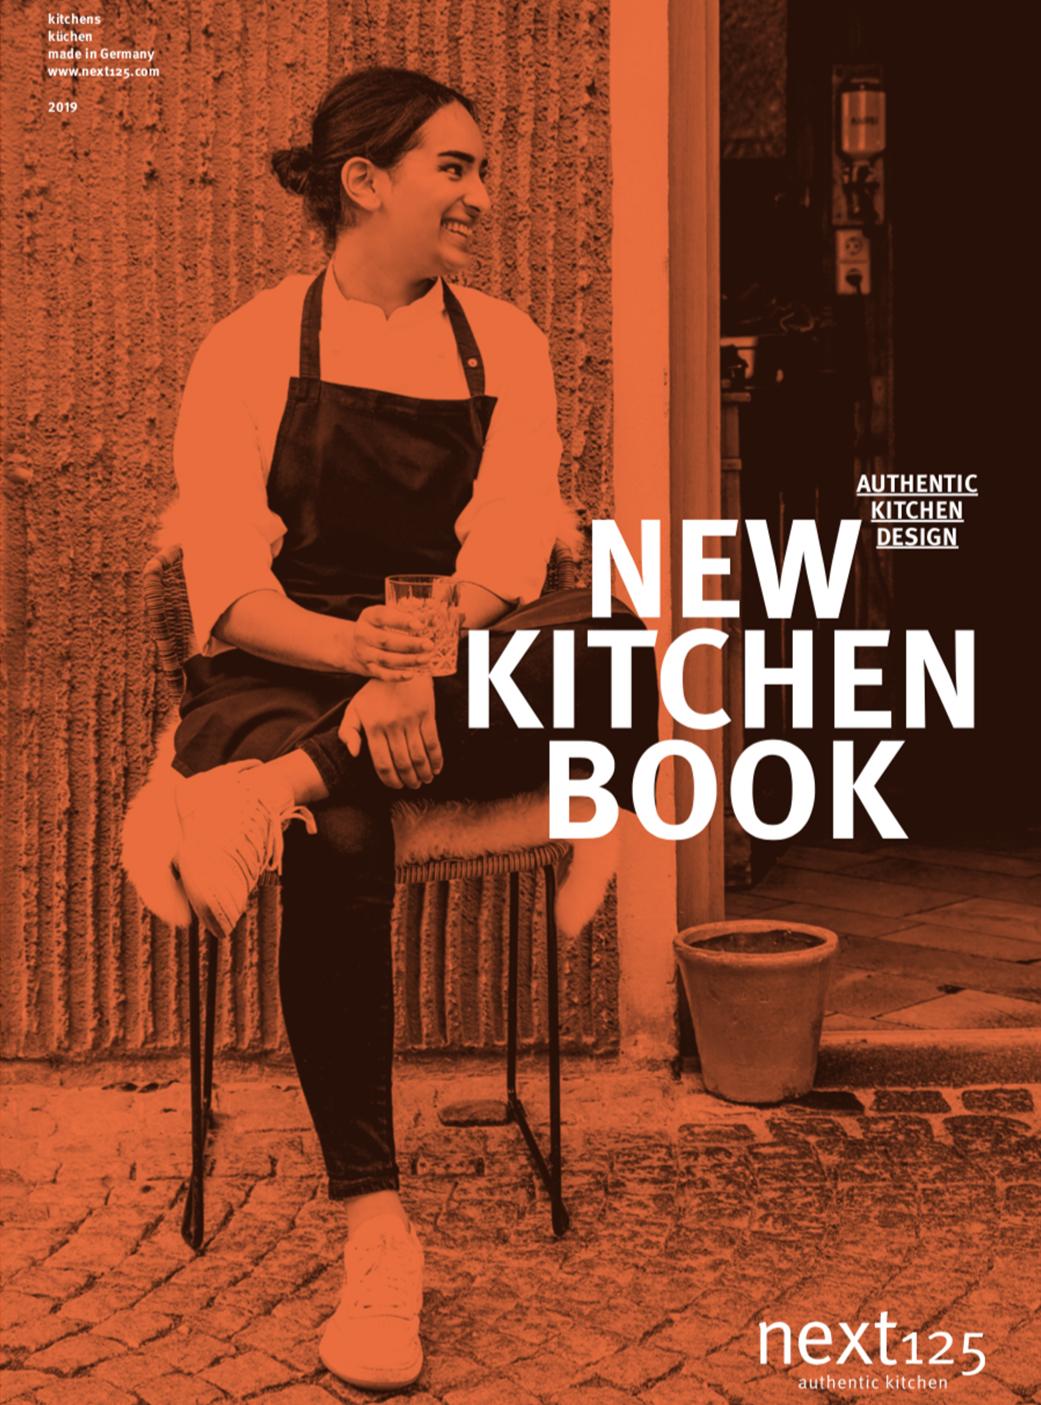 next125 premium kitchen catalogue by Schüller kitchens, Germany' title='NX125 2019'  itemprop=